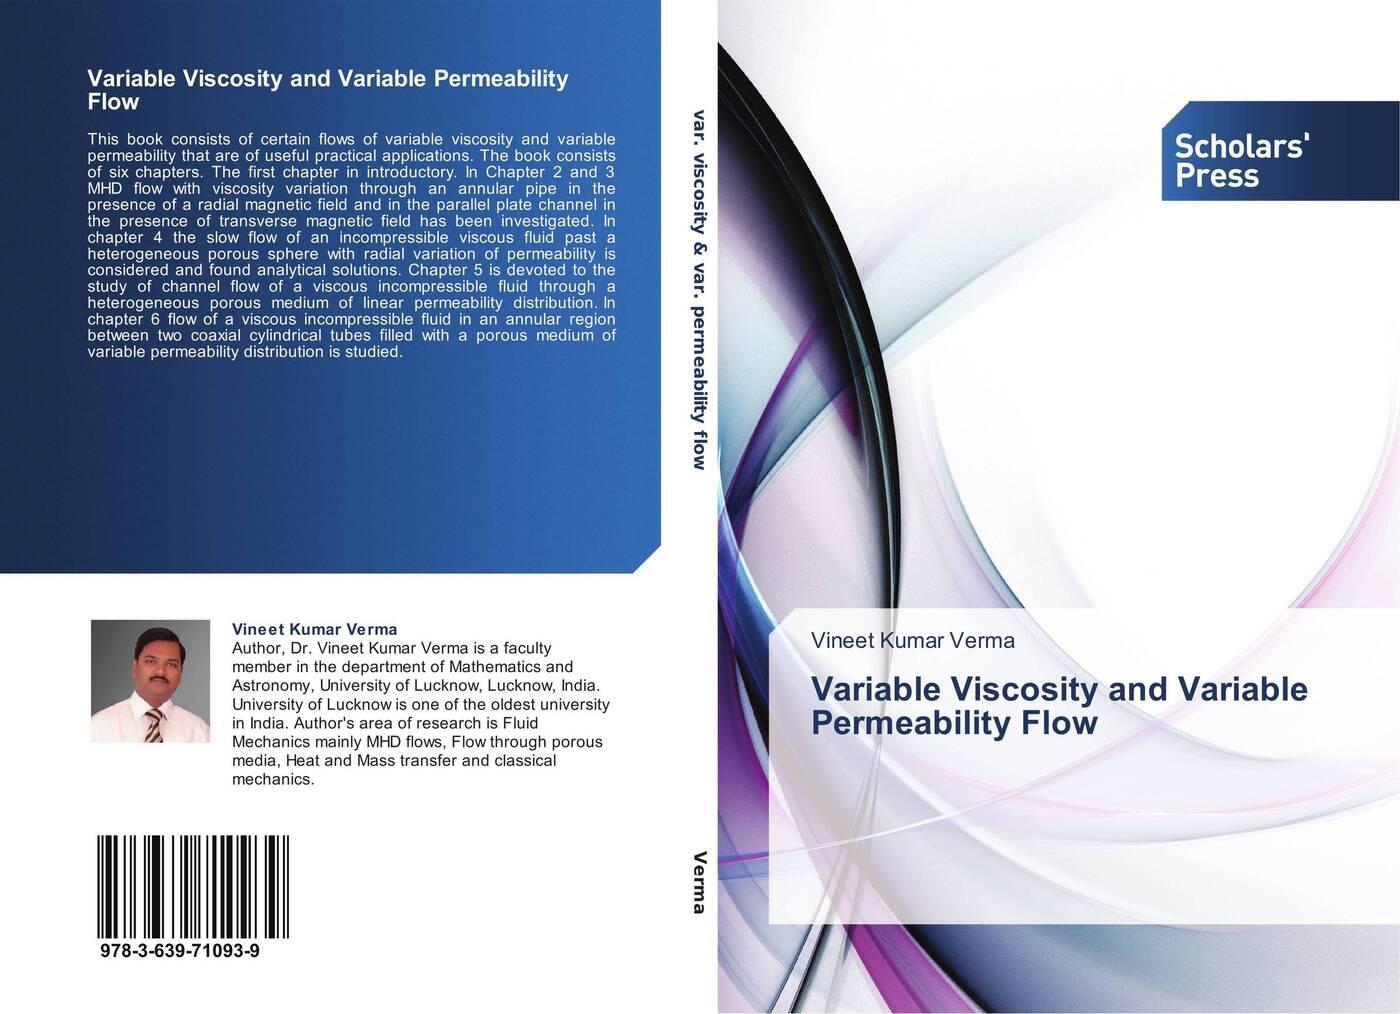 islam eldesoky unsteady mhd pulsatile flow of blood through porous medium Vineet Kumar Verma Variable Viscosity and Variable Permeability Flow